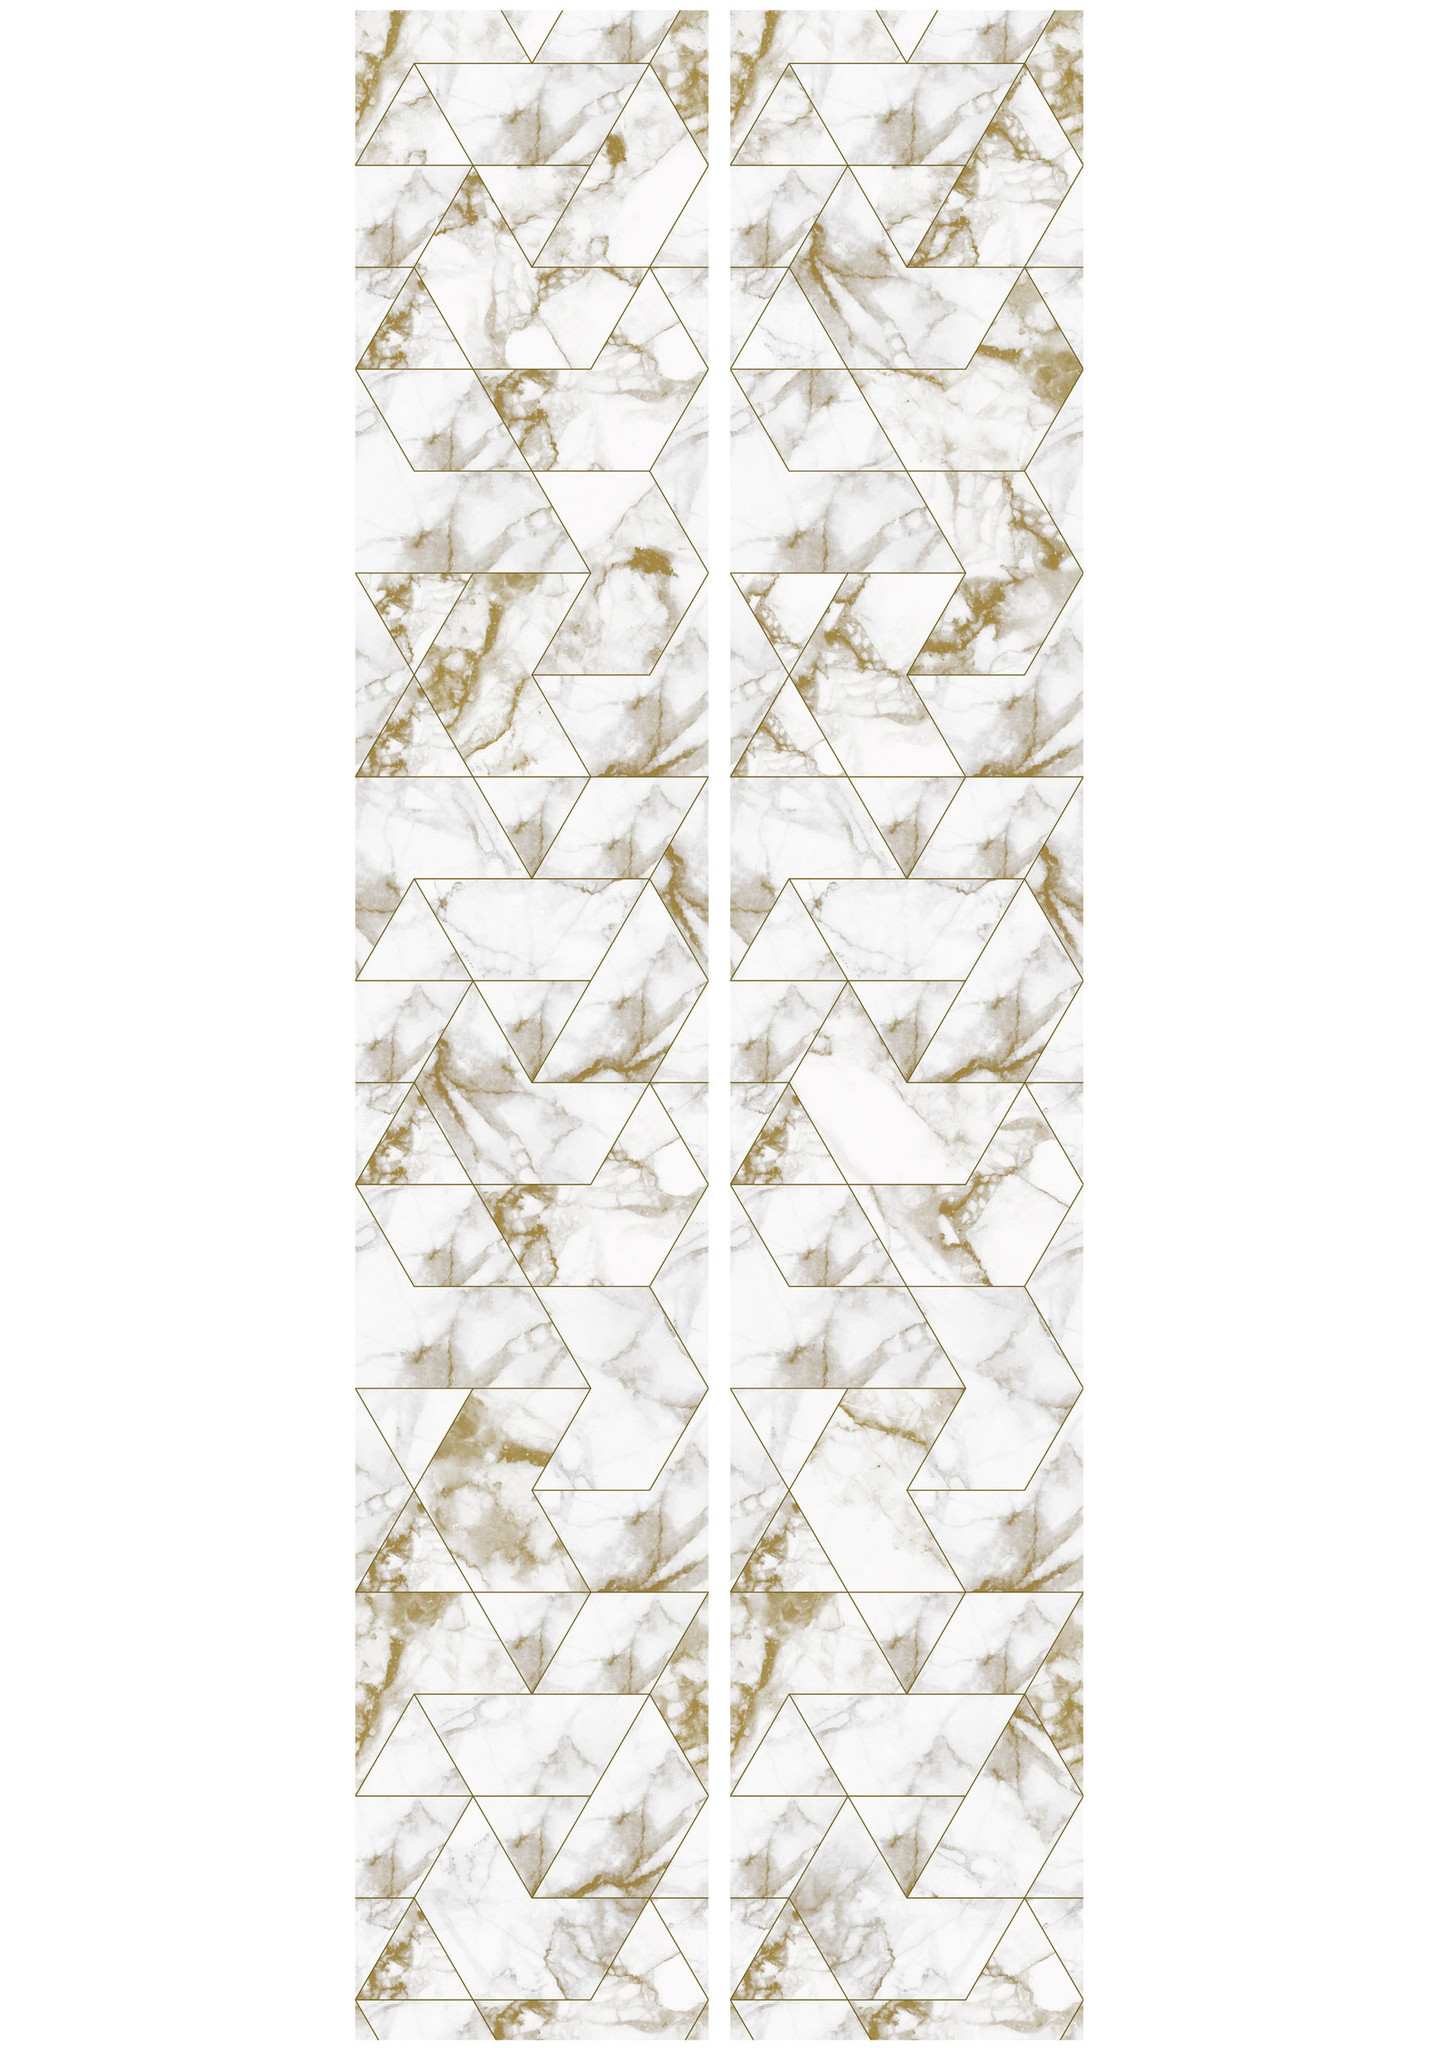 Behang Marmer Mosaic - 97.4 x 280 wit-goud-4